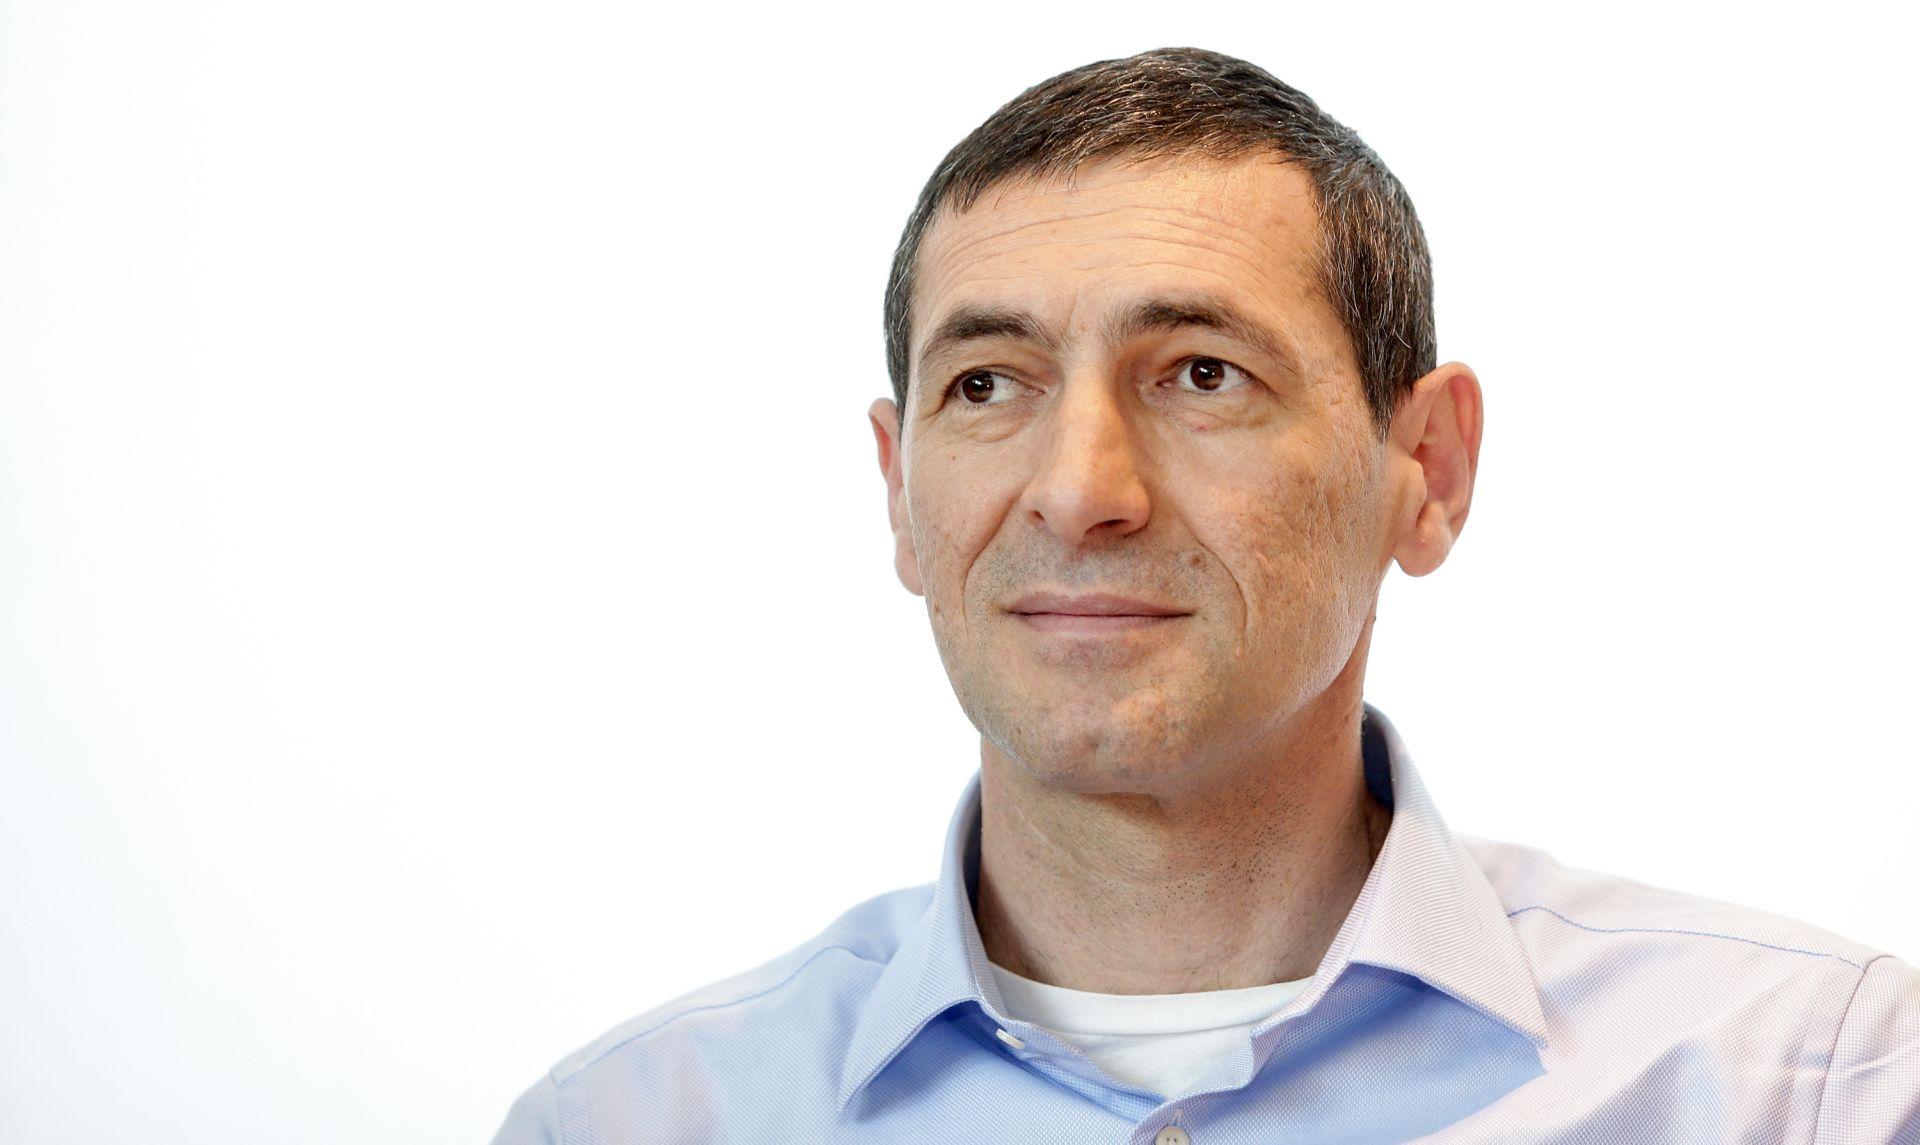 GOST KOLUMNIST: ANTE KOTROMANOVIĆ 'Vlada najavljuje ishitreno čeprkanje po domovinskoj sigurnosti'